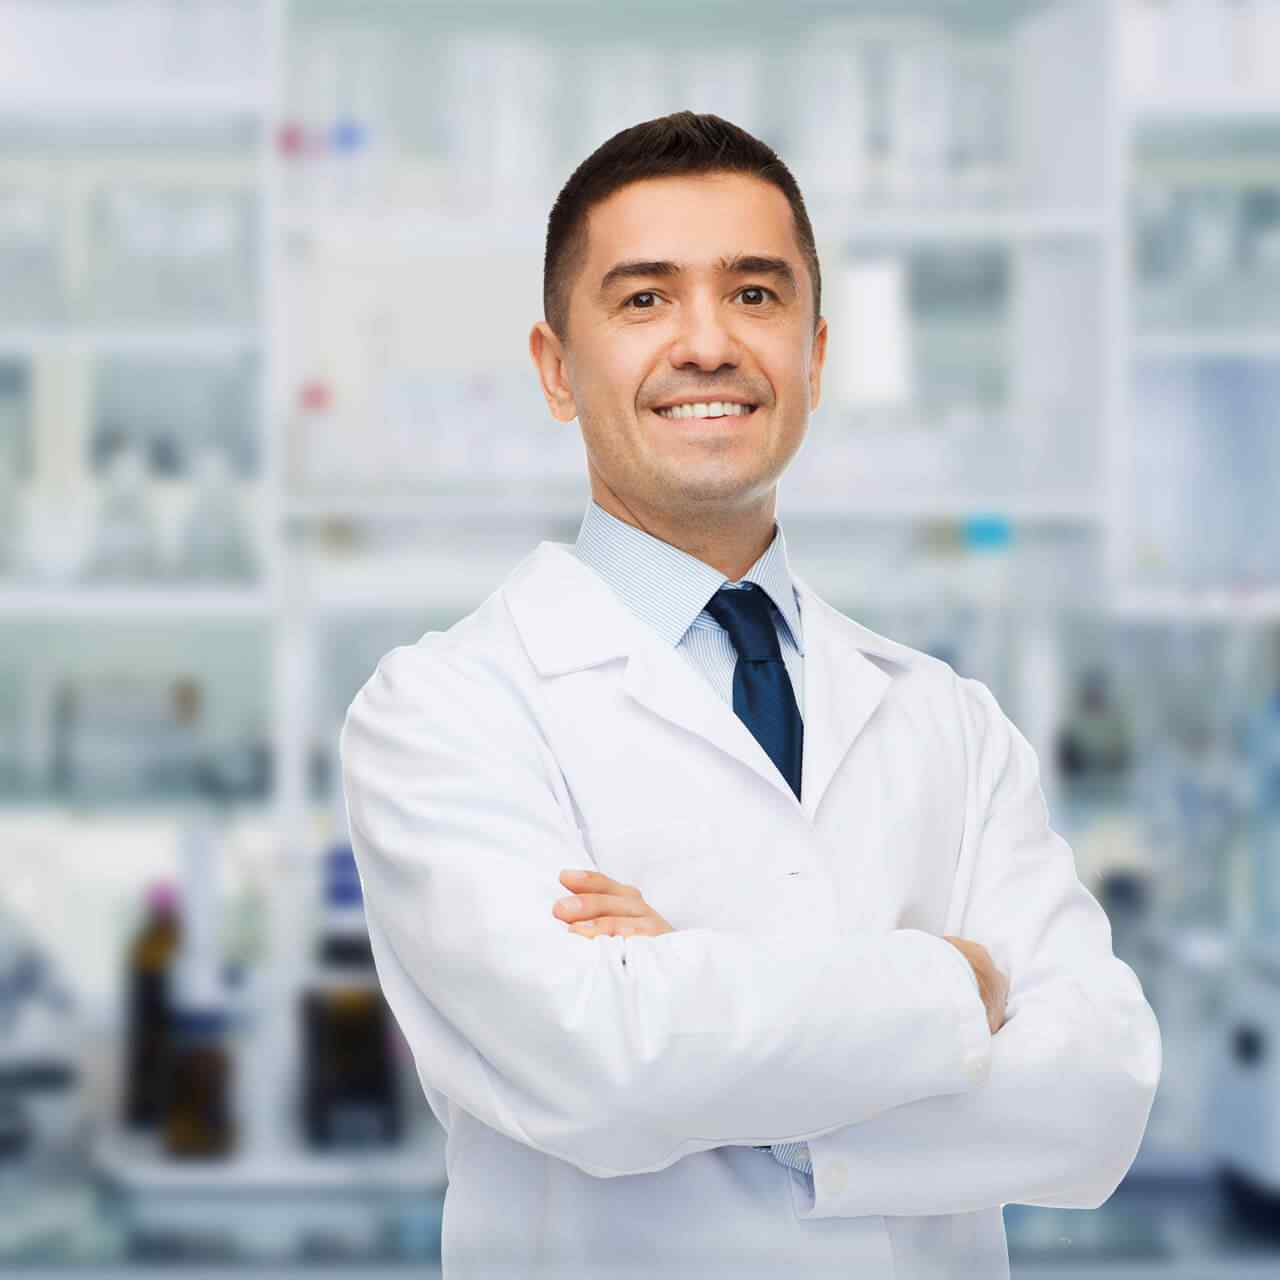 https://www.laboratoriolari.it/wp-content/uploads/2020/04/about-me-03.jpg